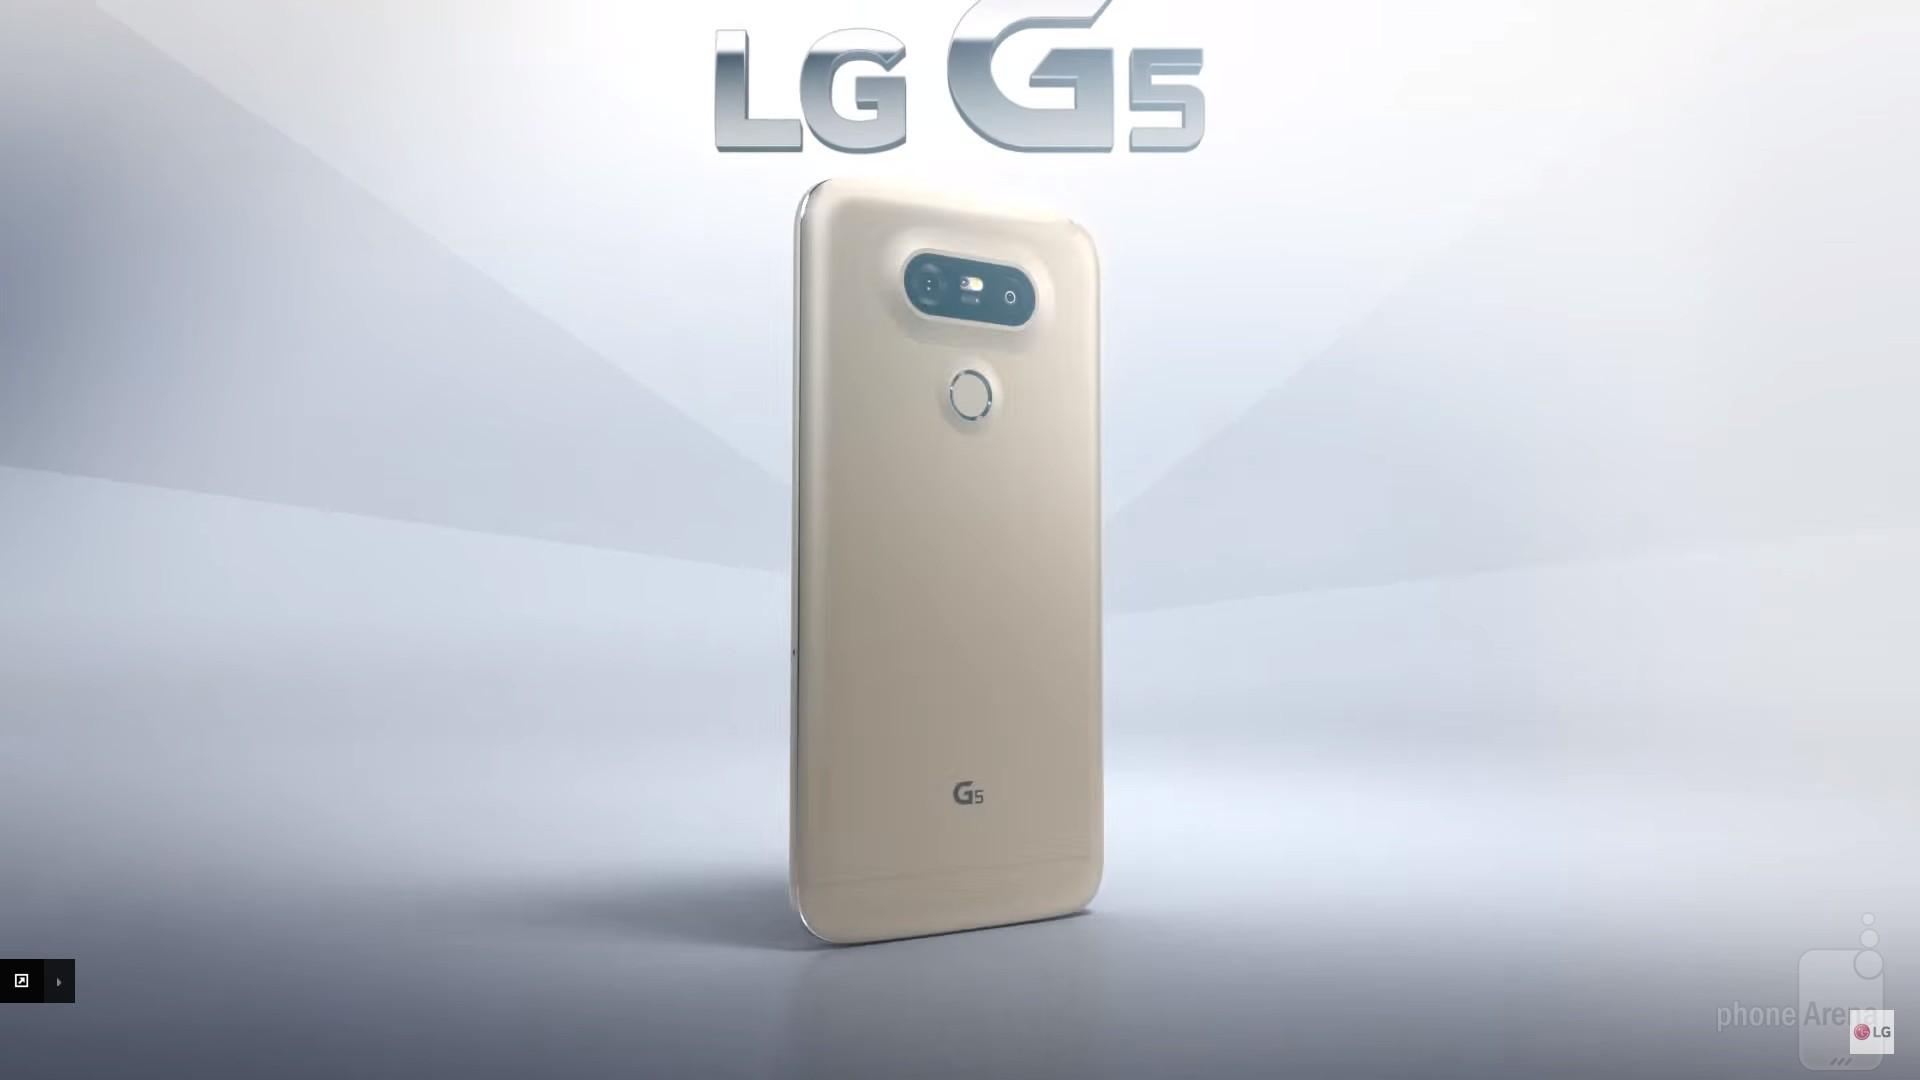 [MWC 2016] เปิดตัวแล้ว LG G5 สเปคสุดแรง Snapdragon 820 พร้อมชุดอัพเกรด ราคา 19,xxx บาท!!